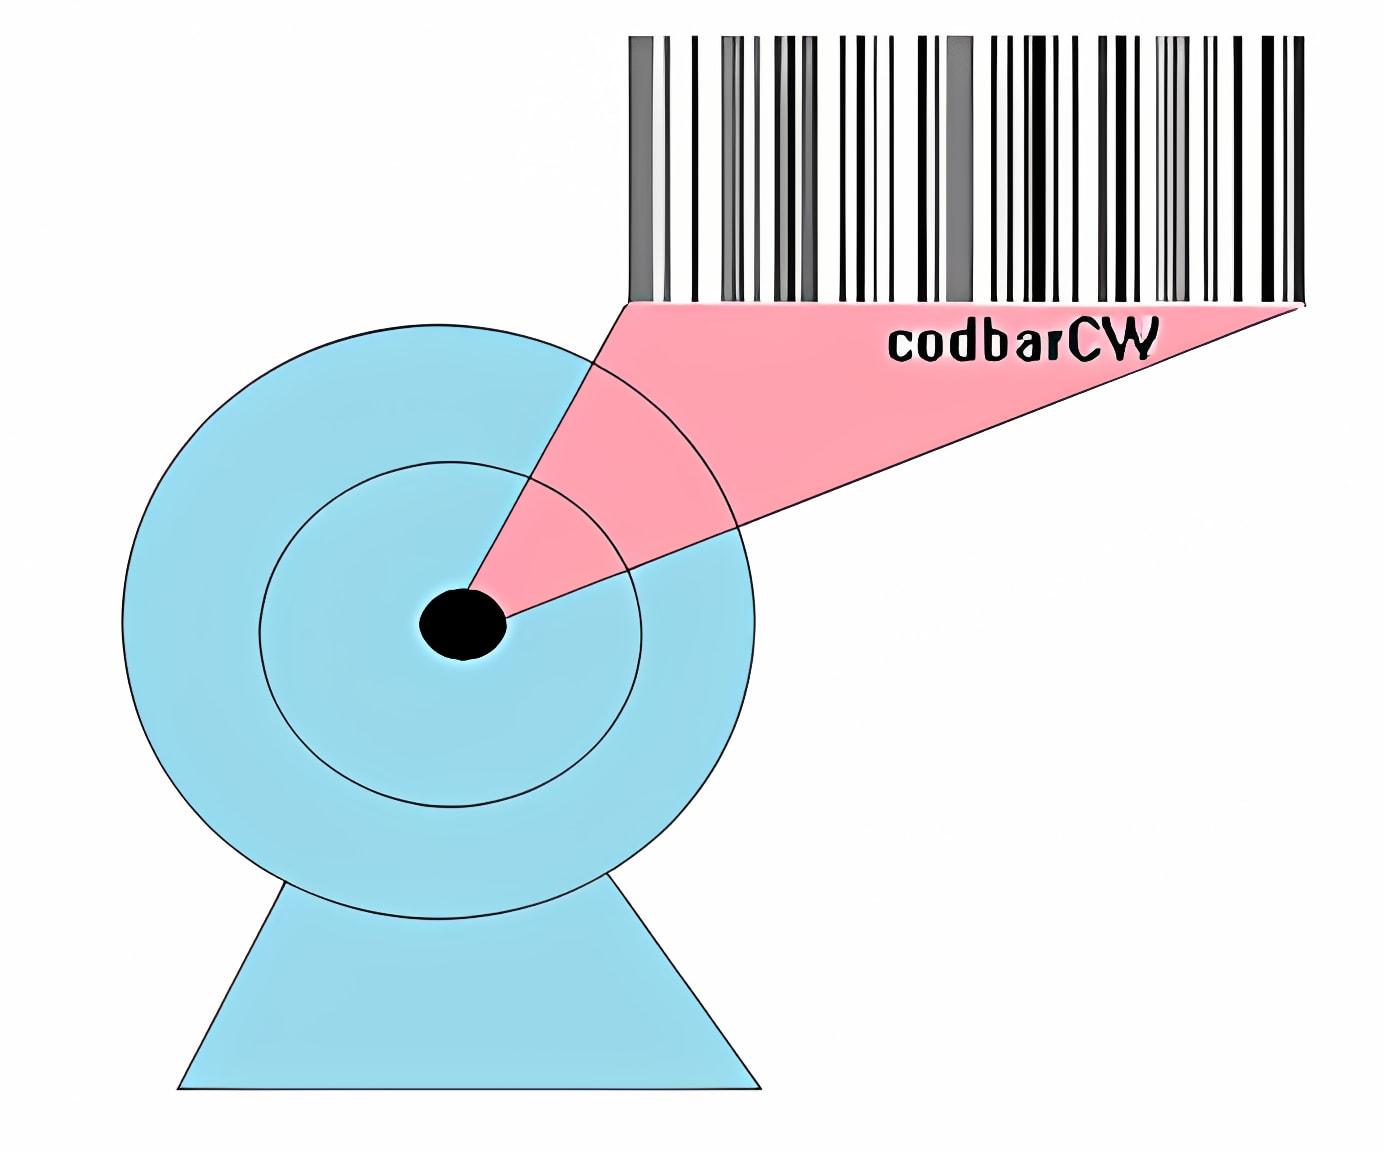 CodBarCW